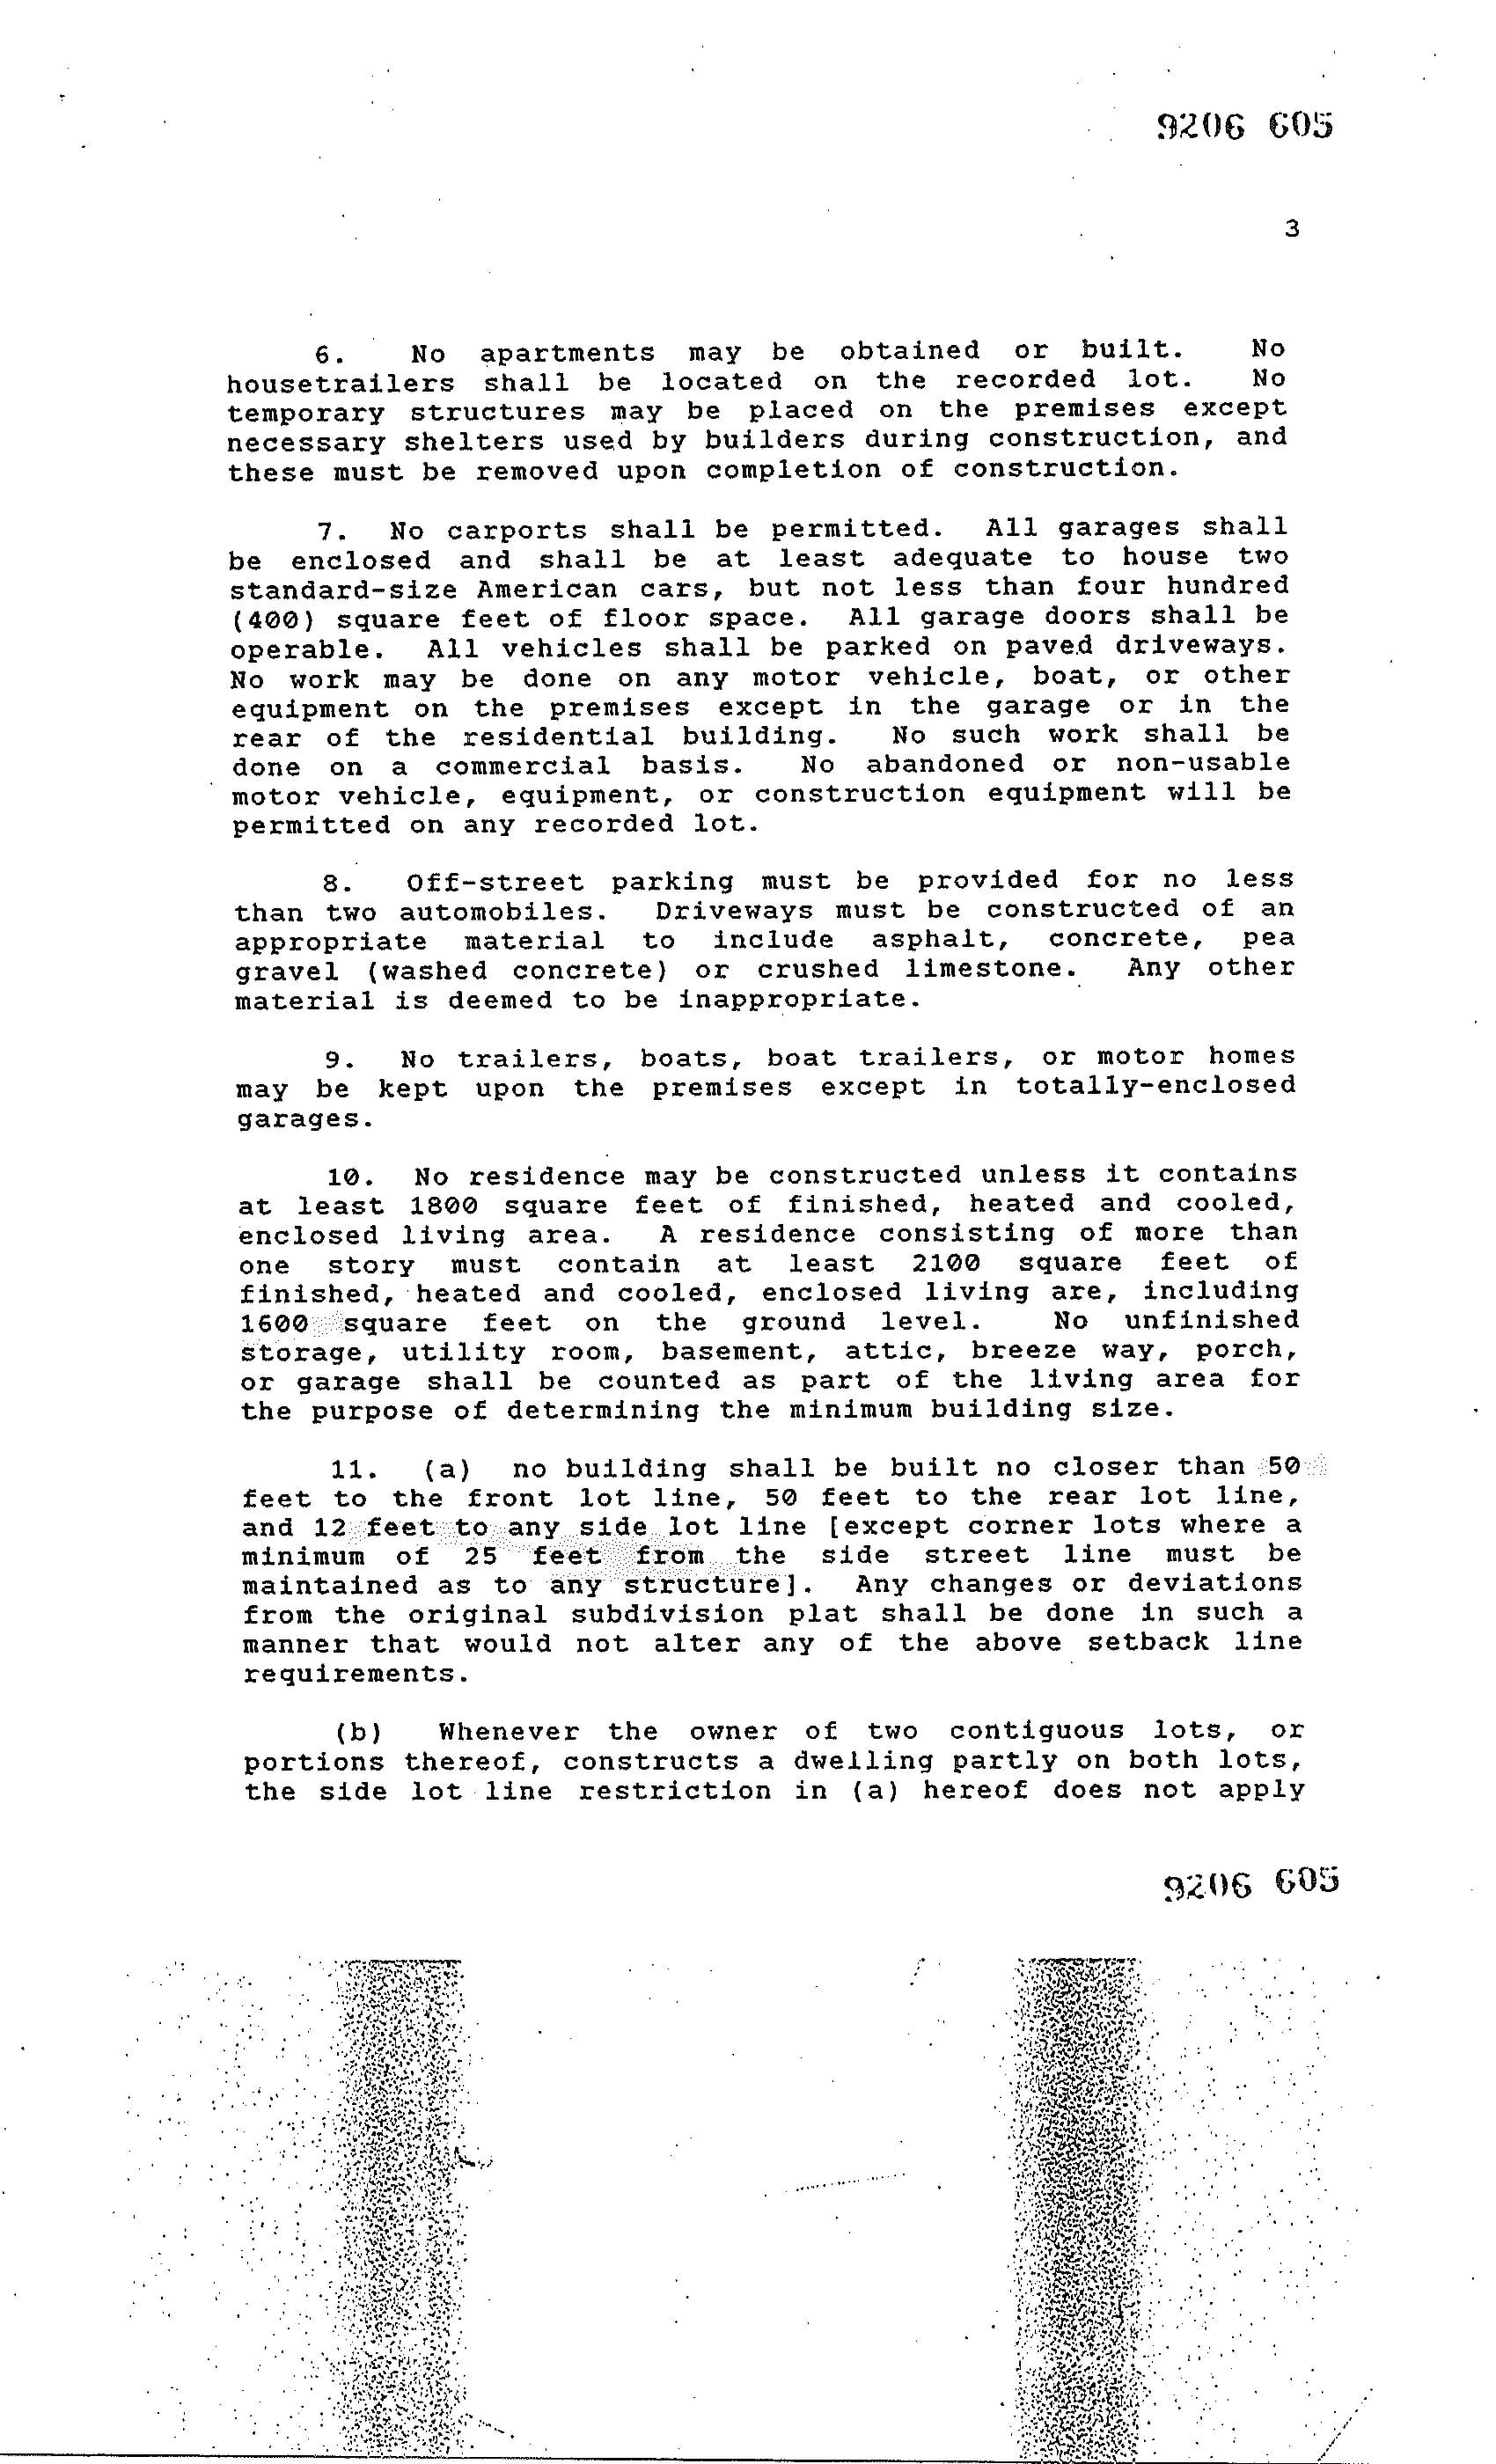 Covenants-Lewis-Estates-3.jpg